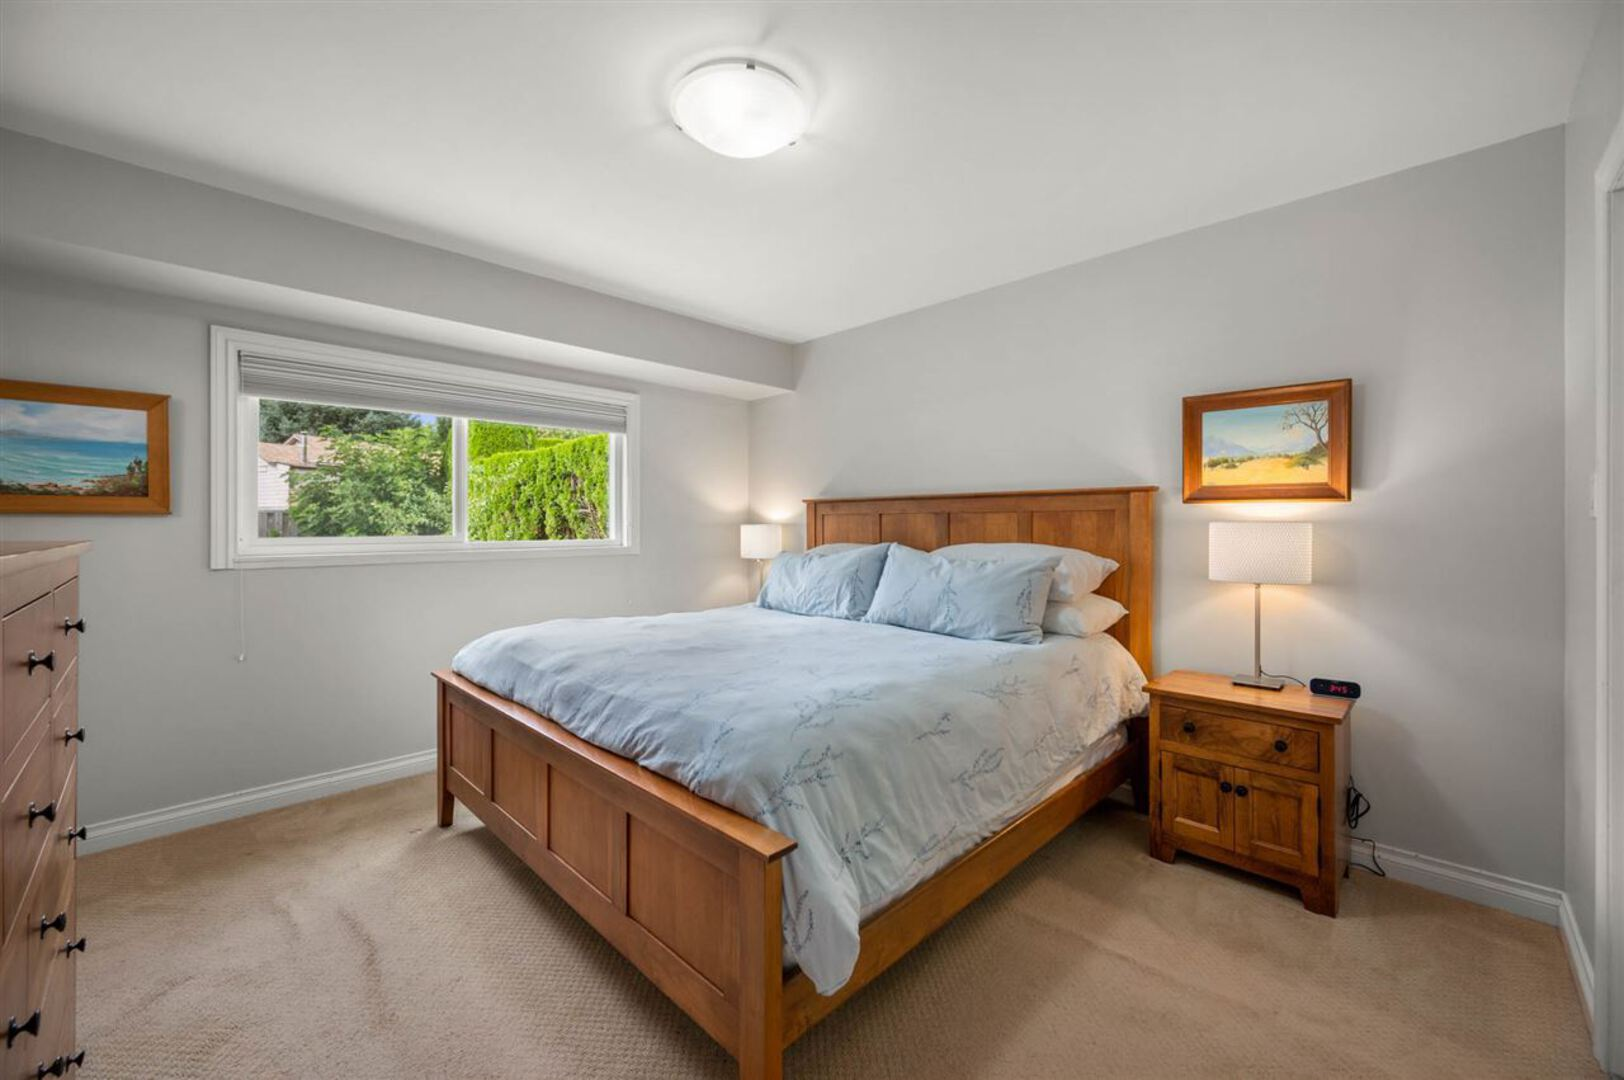 2808-trillium-place-blueridge-nv-north-vancouver-22 at 2808 Trillium Place, Blueridge NV, North Vancouver